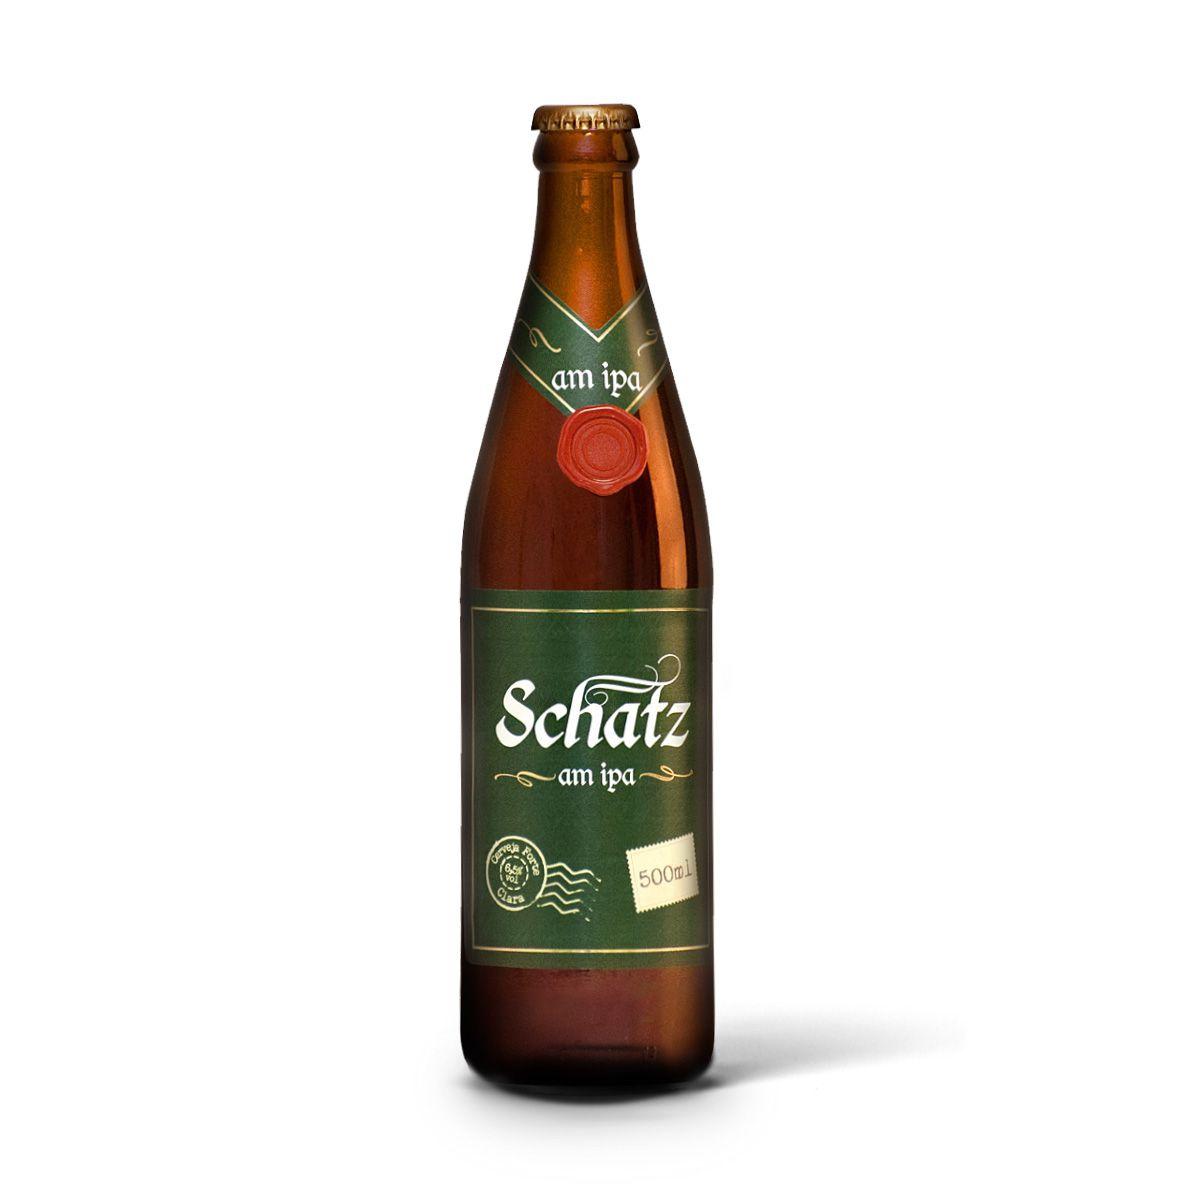 Schatz India Pale Ale IPA AlquimIPA 500ml